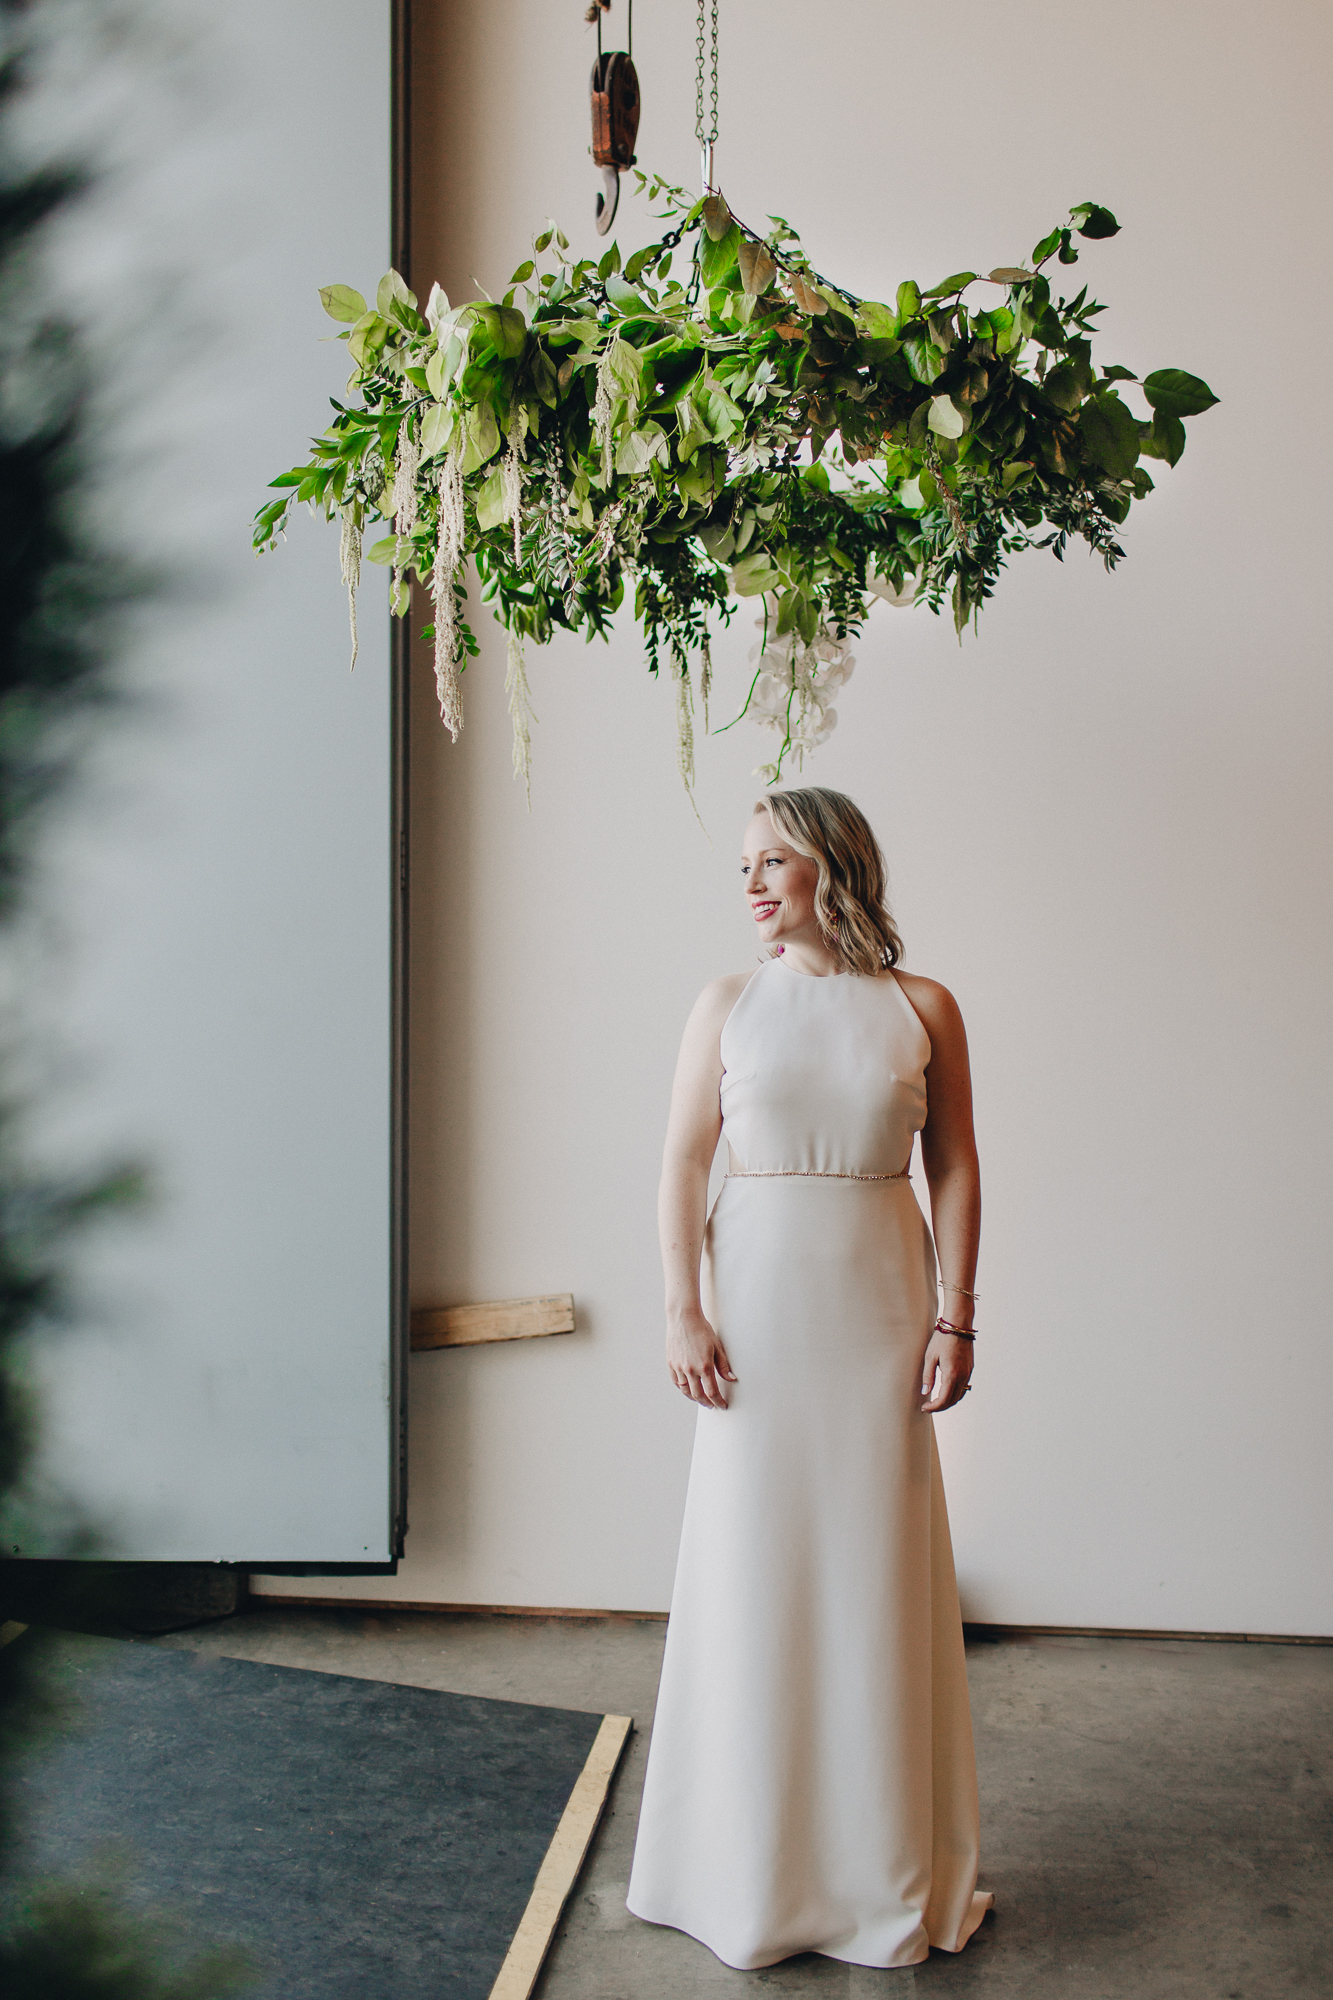 canvas event space wedding photos by Krista Welch-0040.jpg